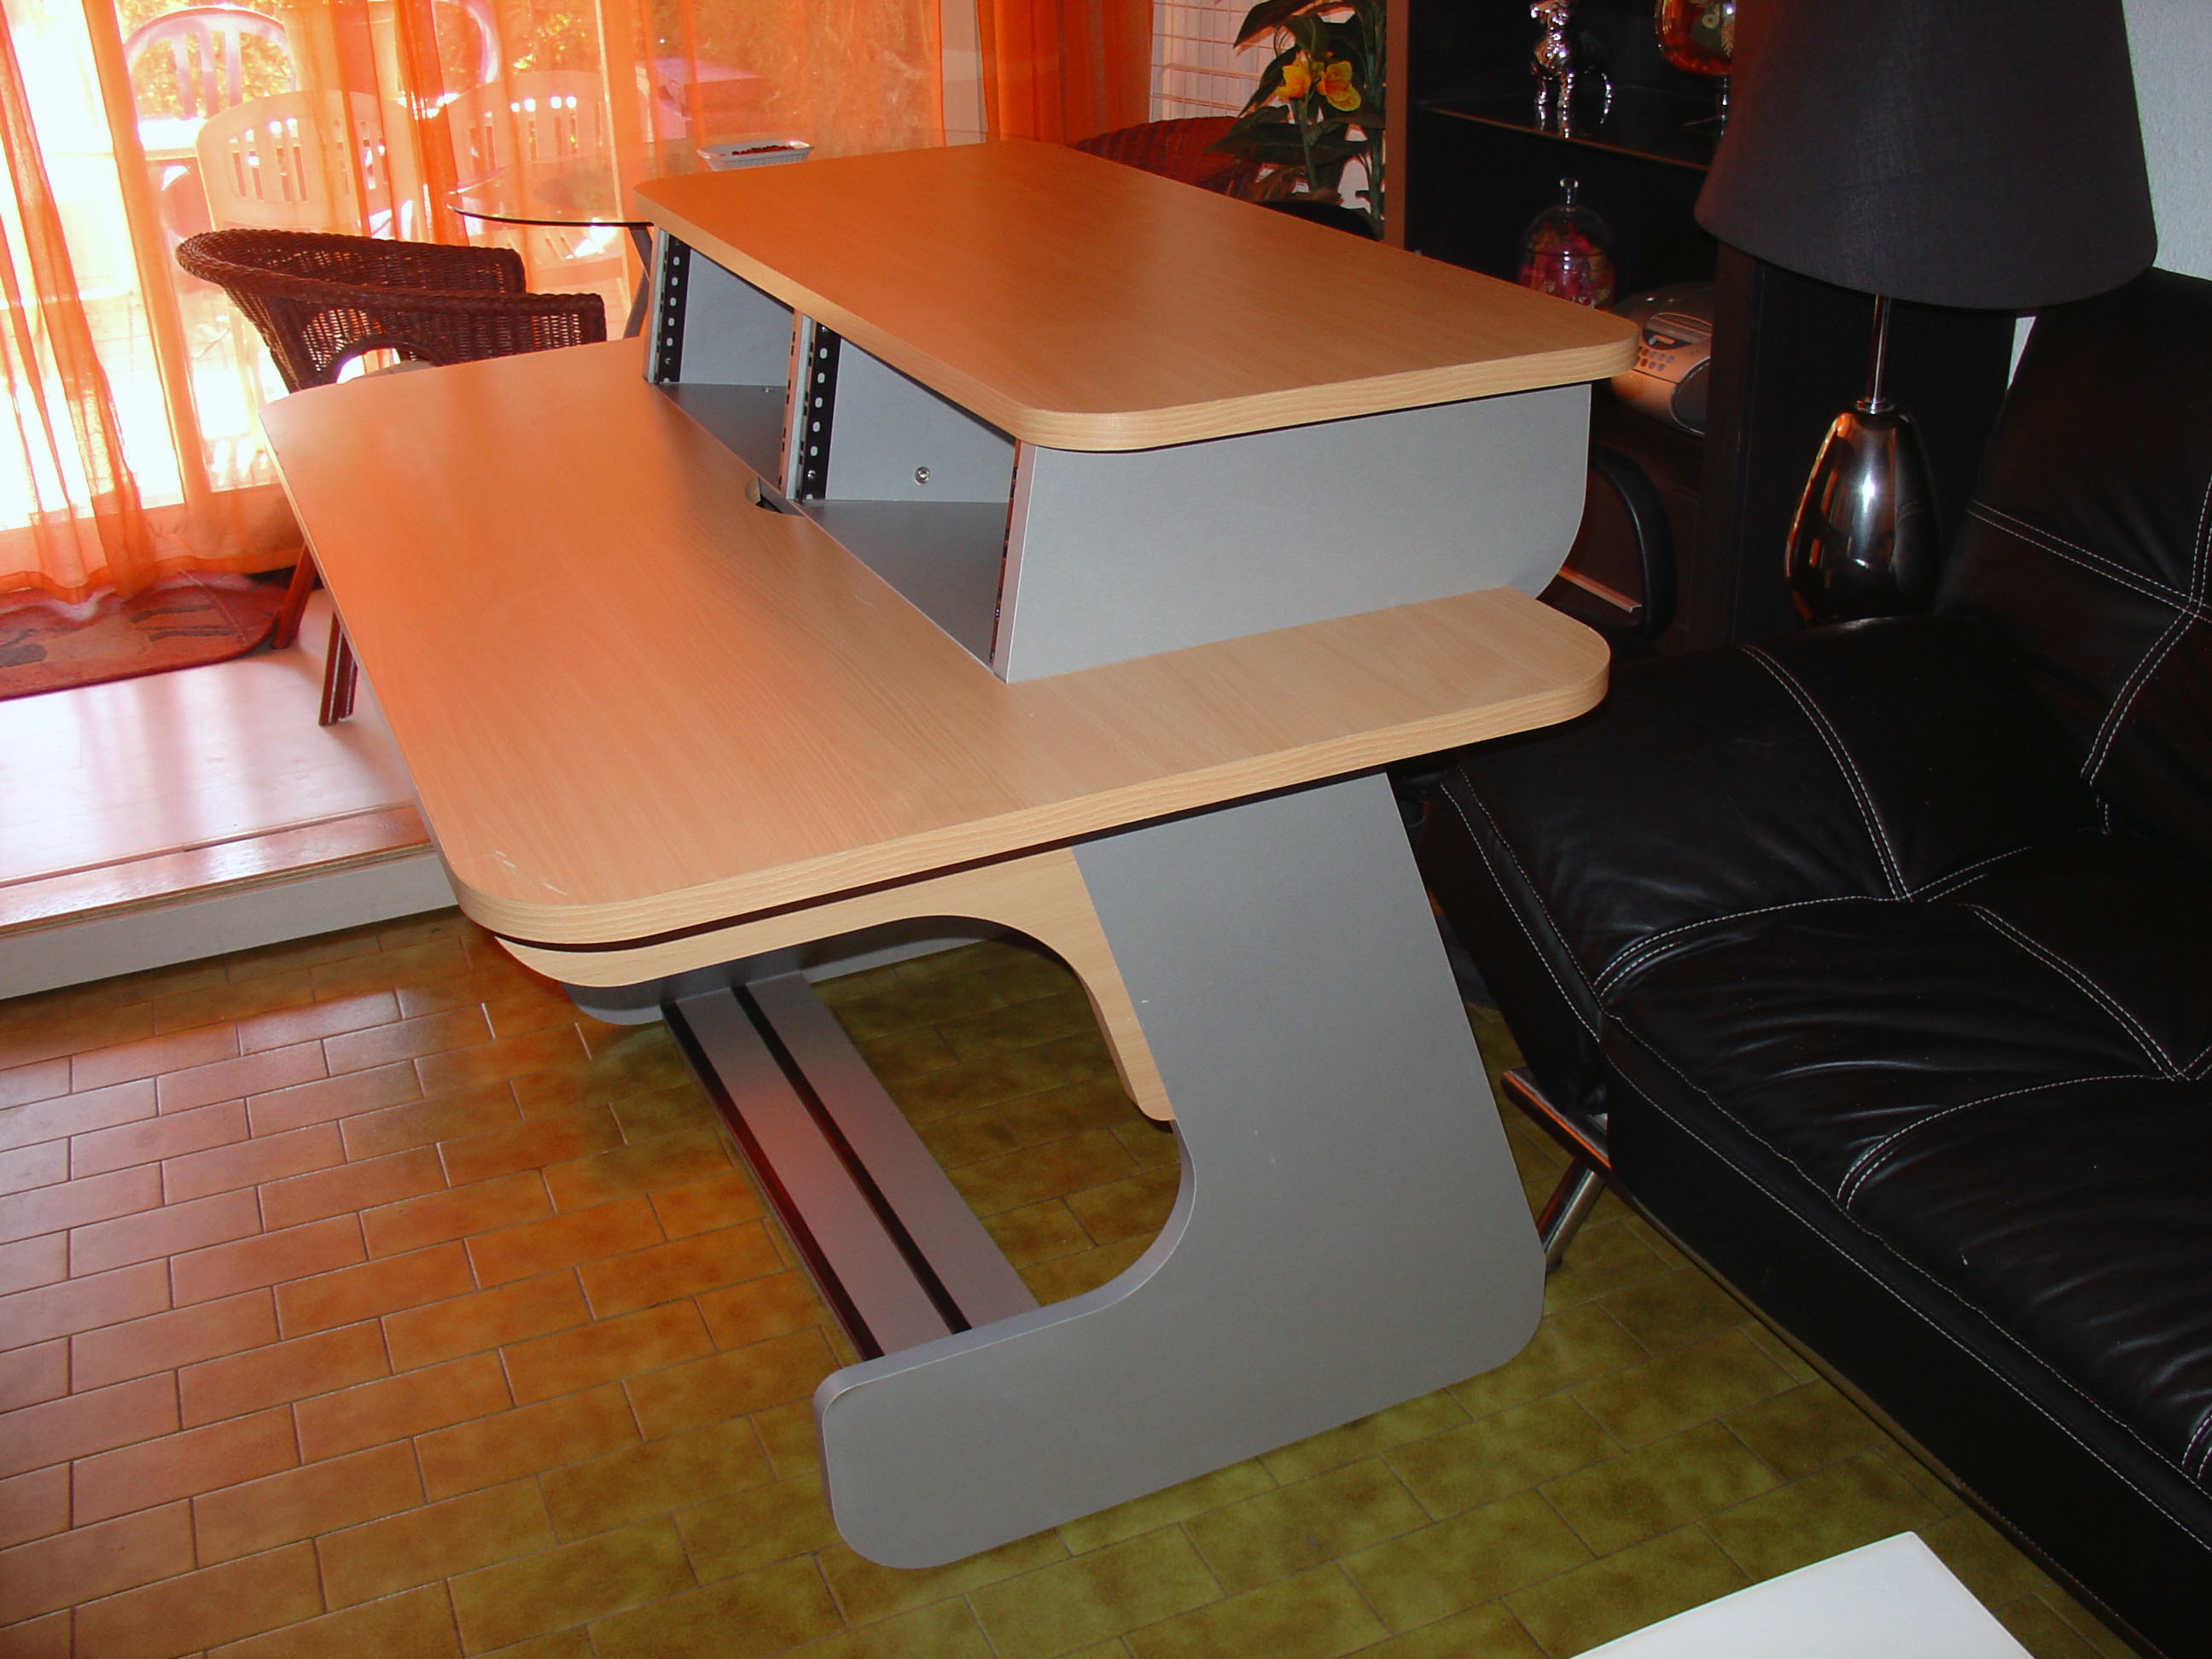 miza station zaor miza station audiofanzine